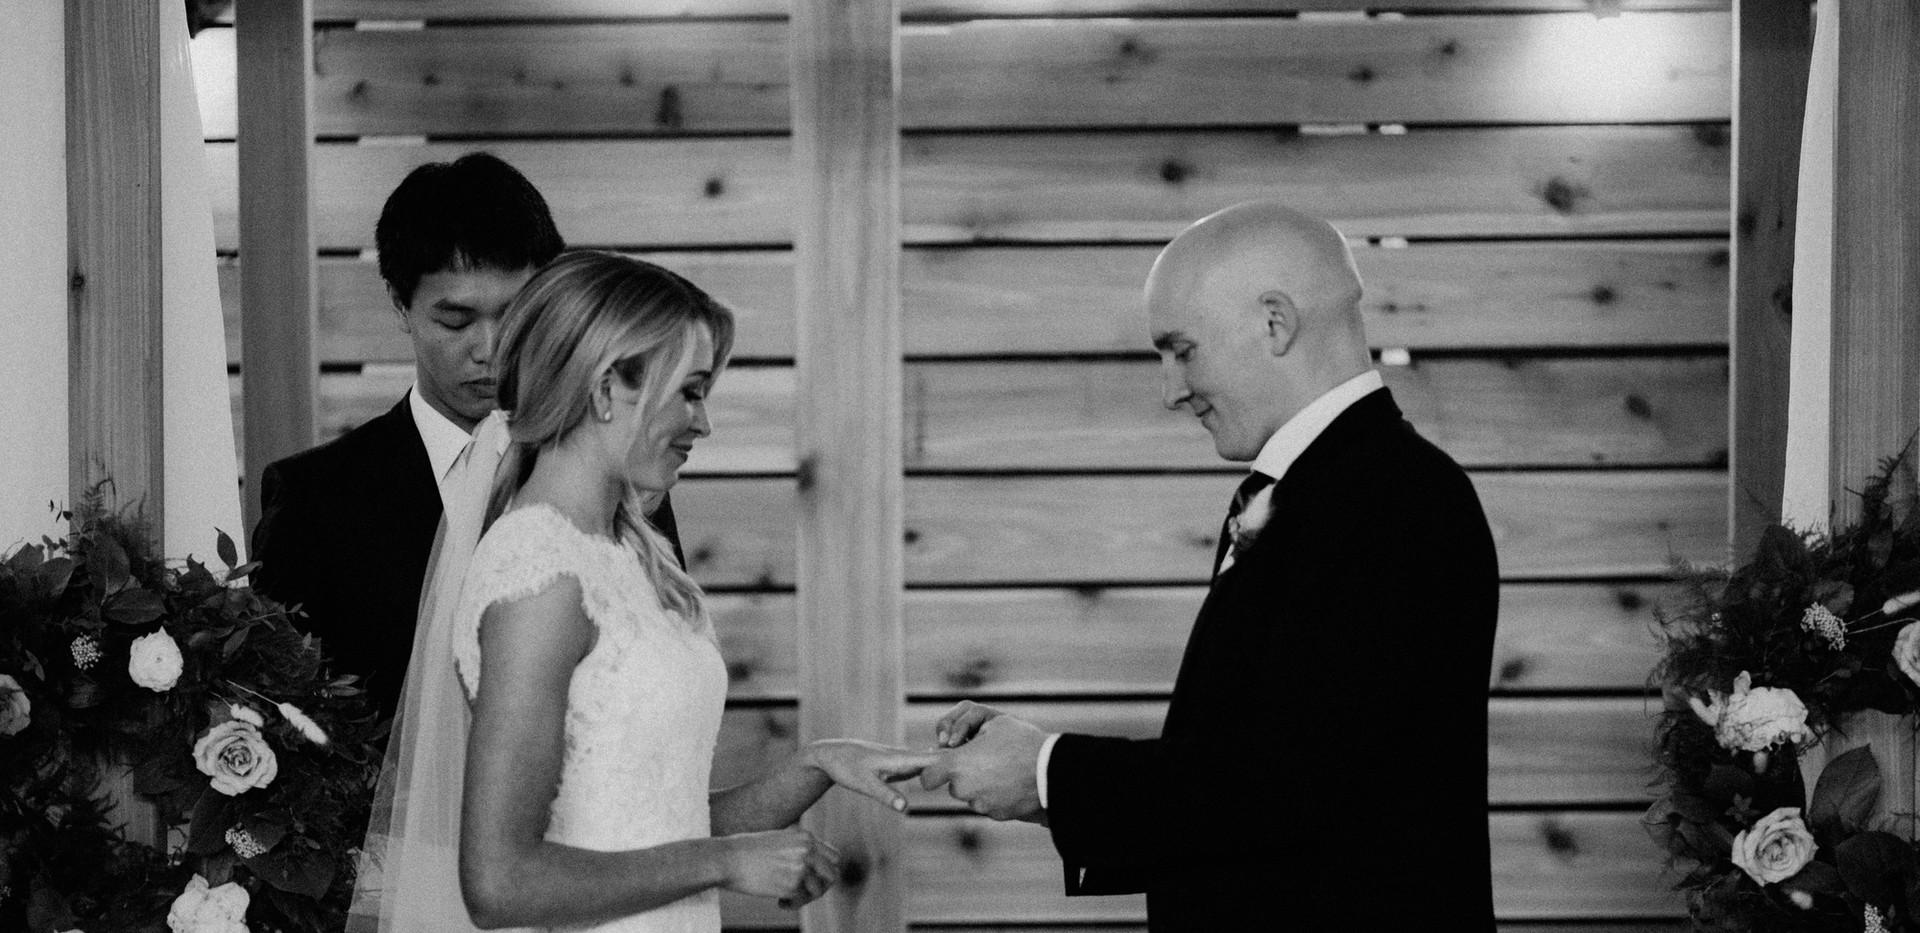 Weddings Vows